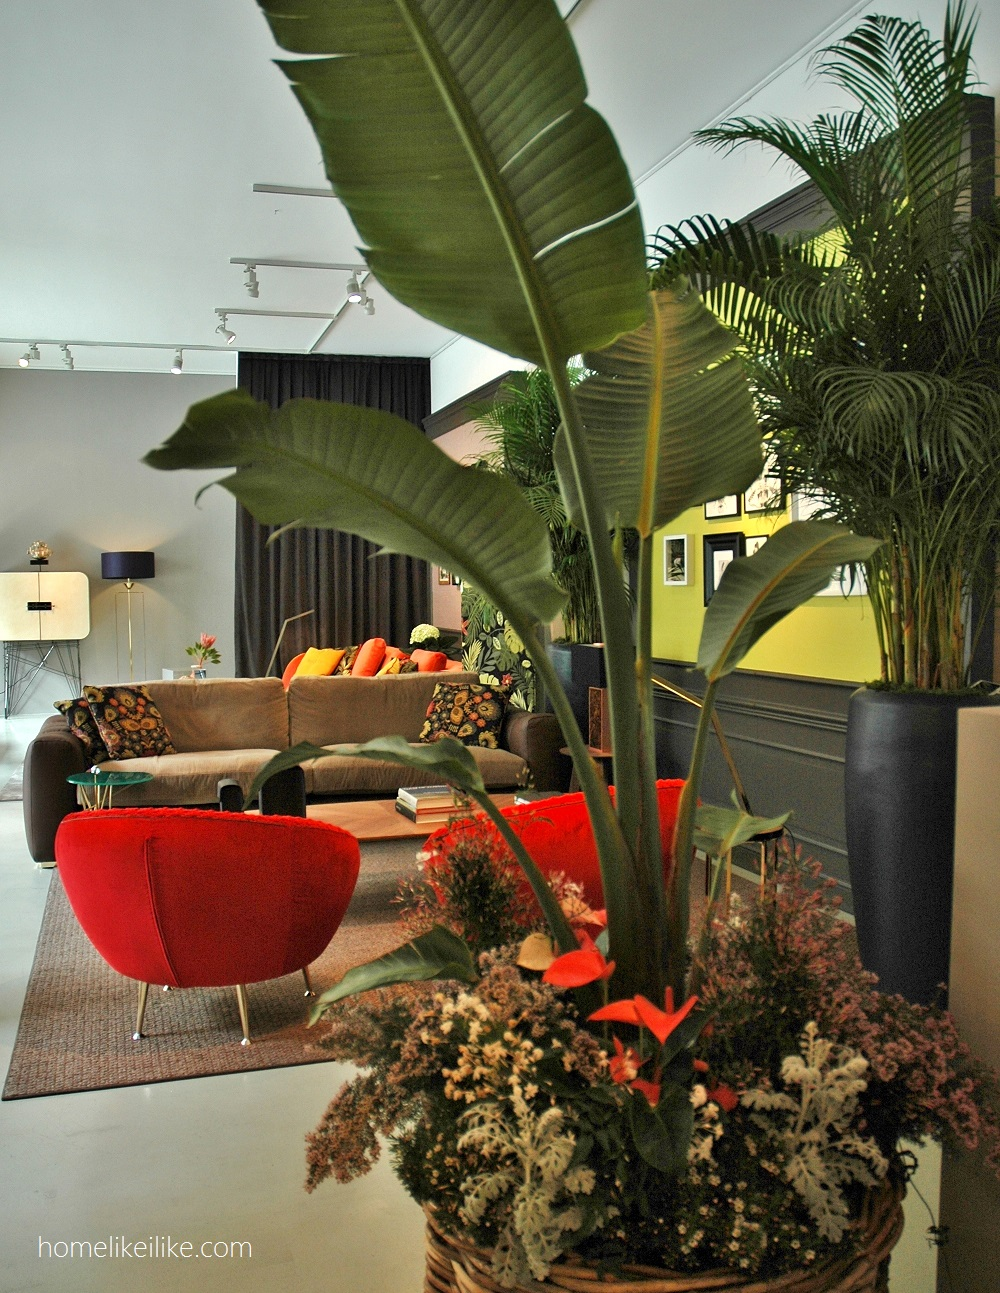 piante tropicali della black tie - homelikeilike.com